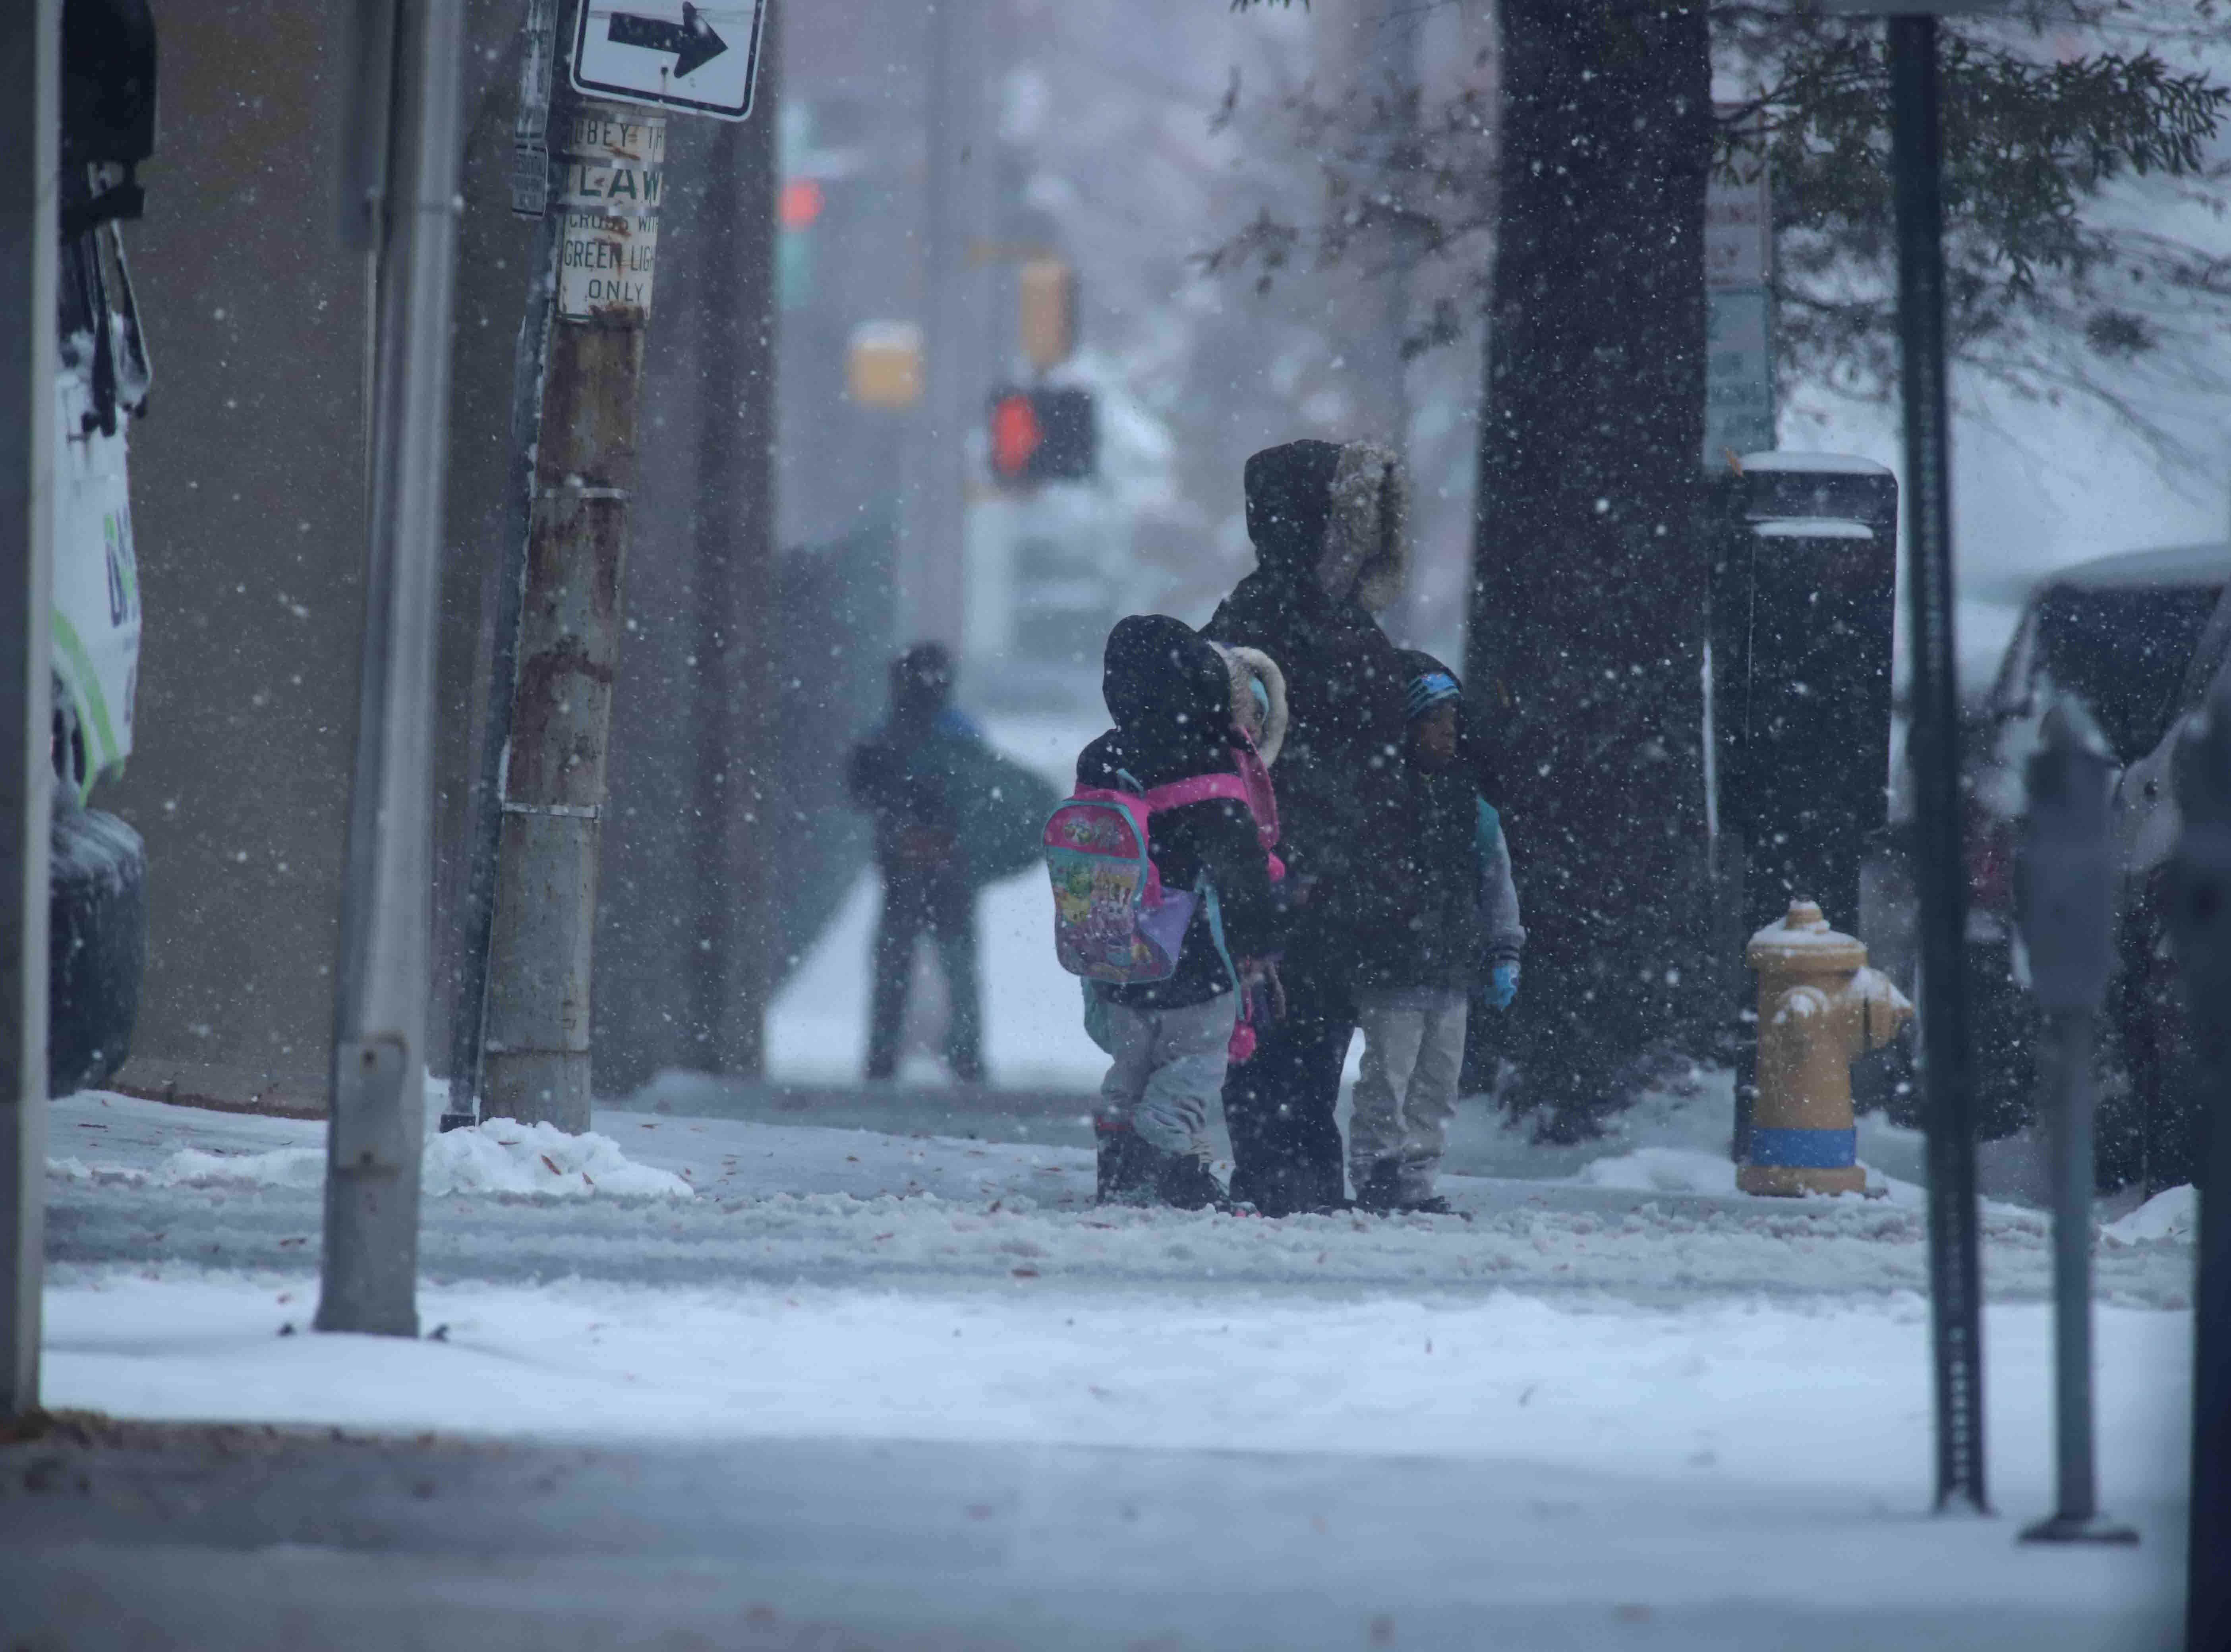 Pedestrians walking down North King Street during heavy snowfall on Thursday, Nov. 15, 2018, in Wilmington.